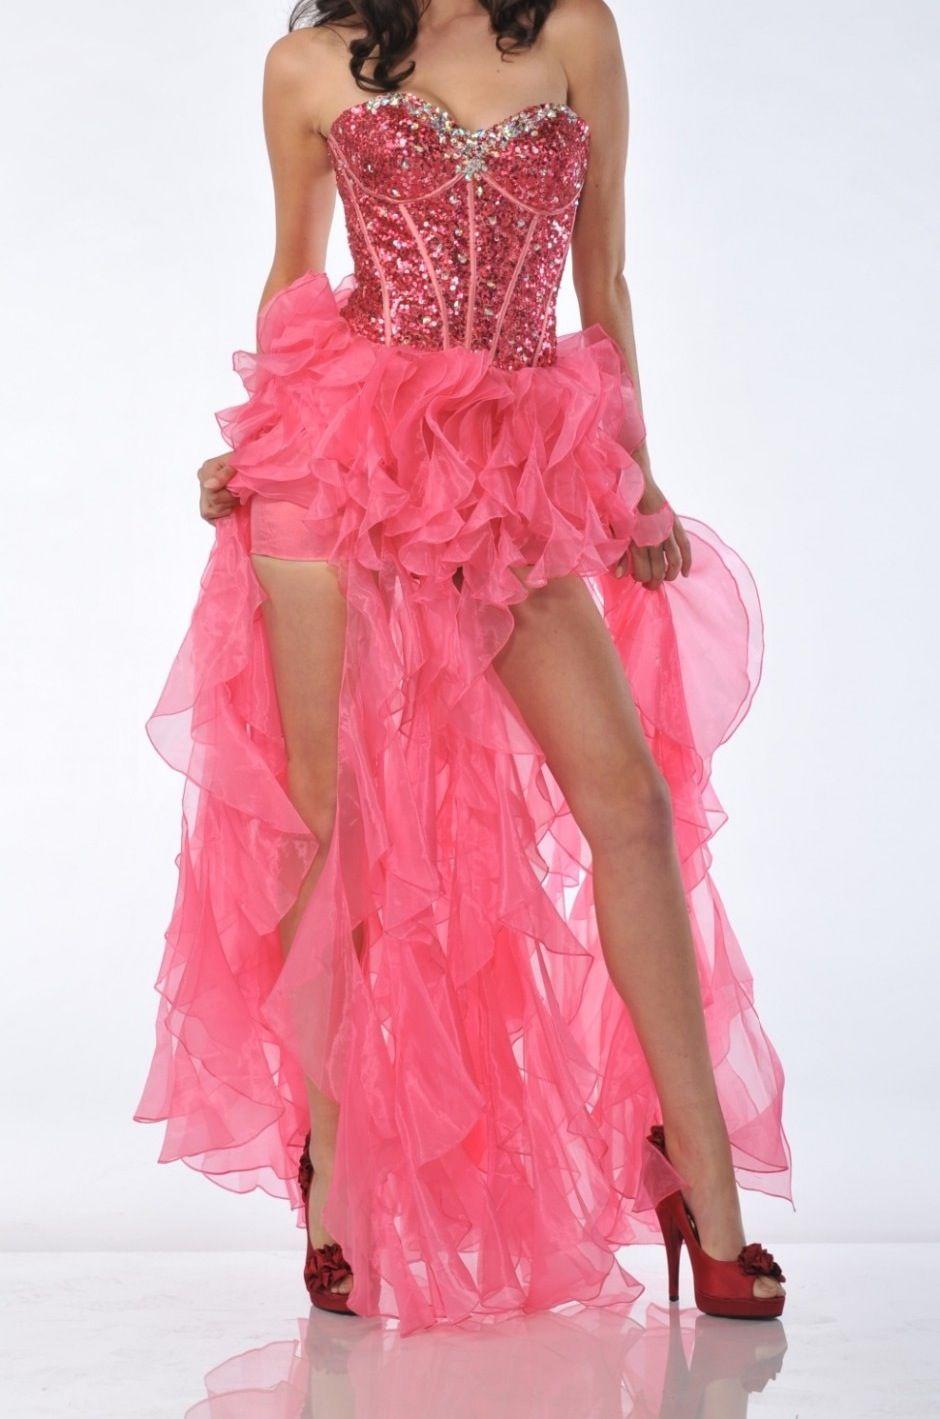 Pin by regan culp on dresses pinterest